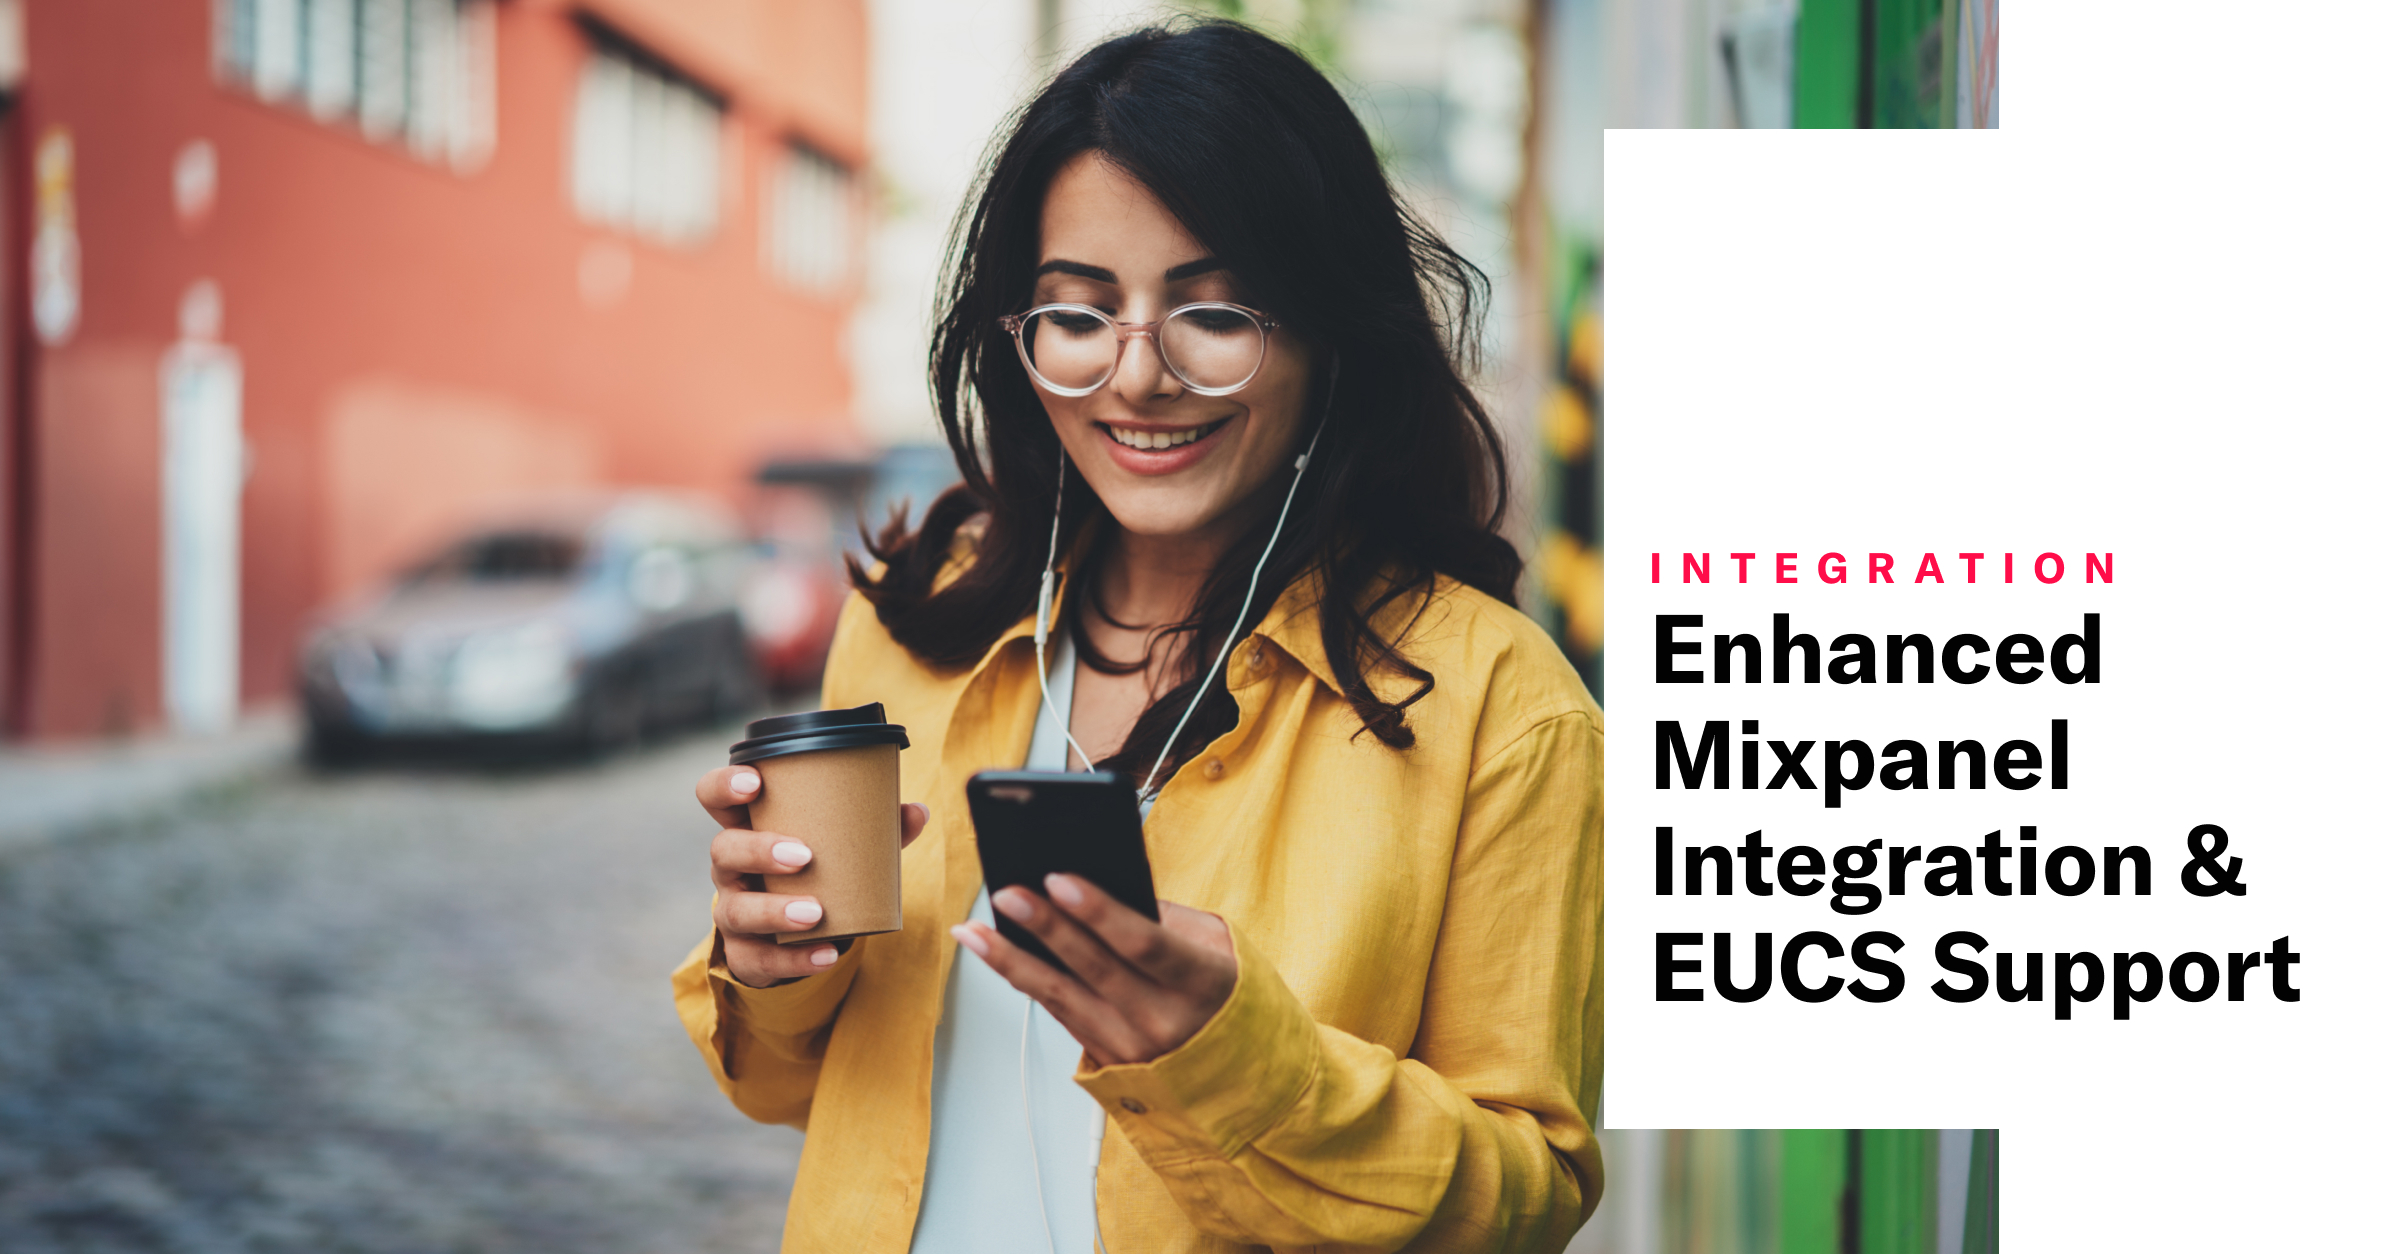 Mixpanel Inbound Integration Update